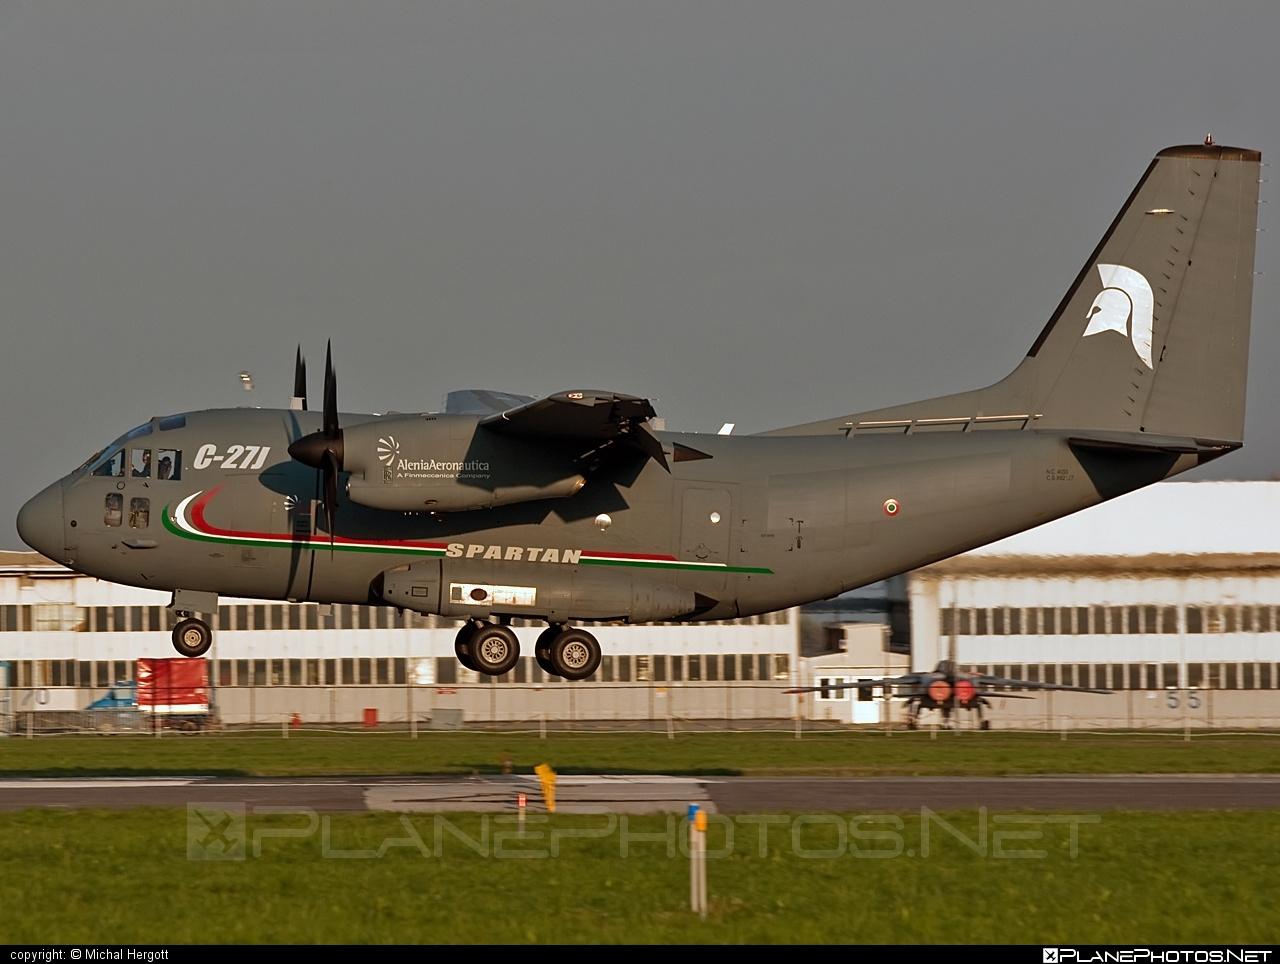 Alenia C-27J Spartan - CSX62127 operated by Aeronautica Militare (Italian Air Force) #alenia #aleniac27j #aleniac27jspartan #aleniaspartan #c27j #c27jspartan #c27spartan